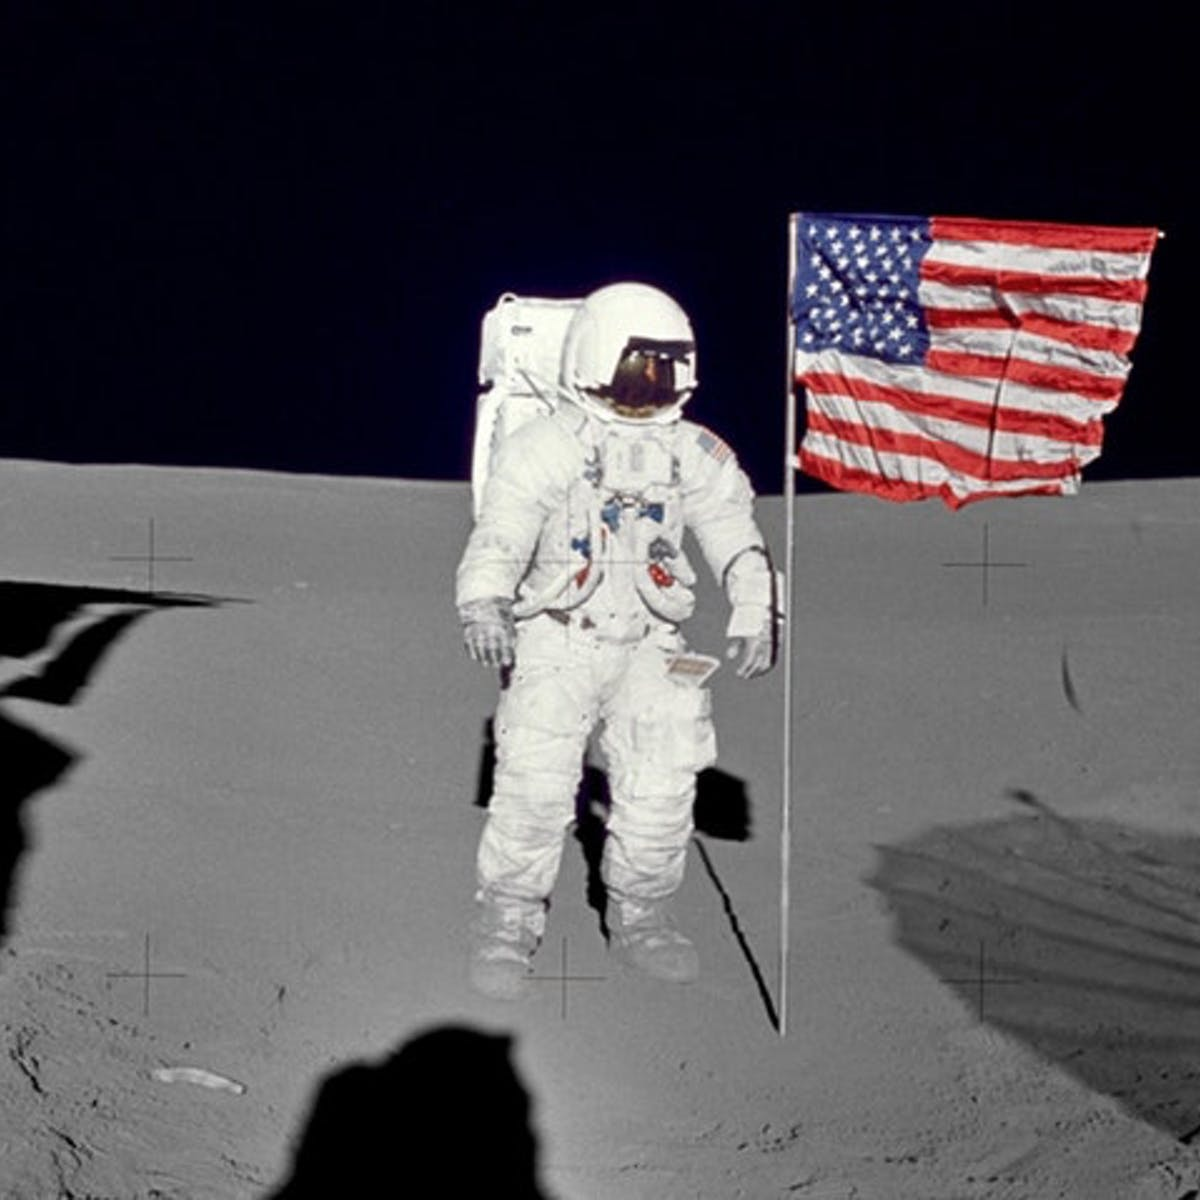 Friday essay: shadows on the Moon - a tale of ephemeral